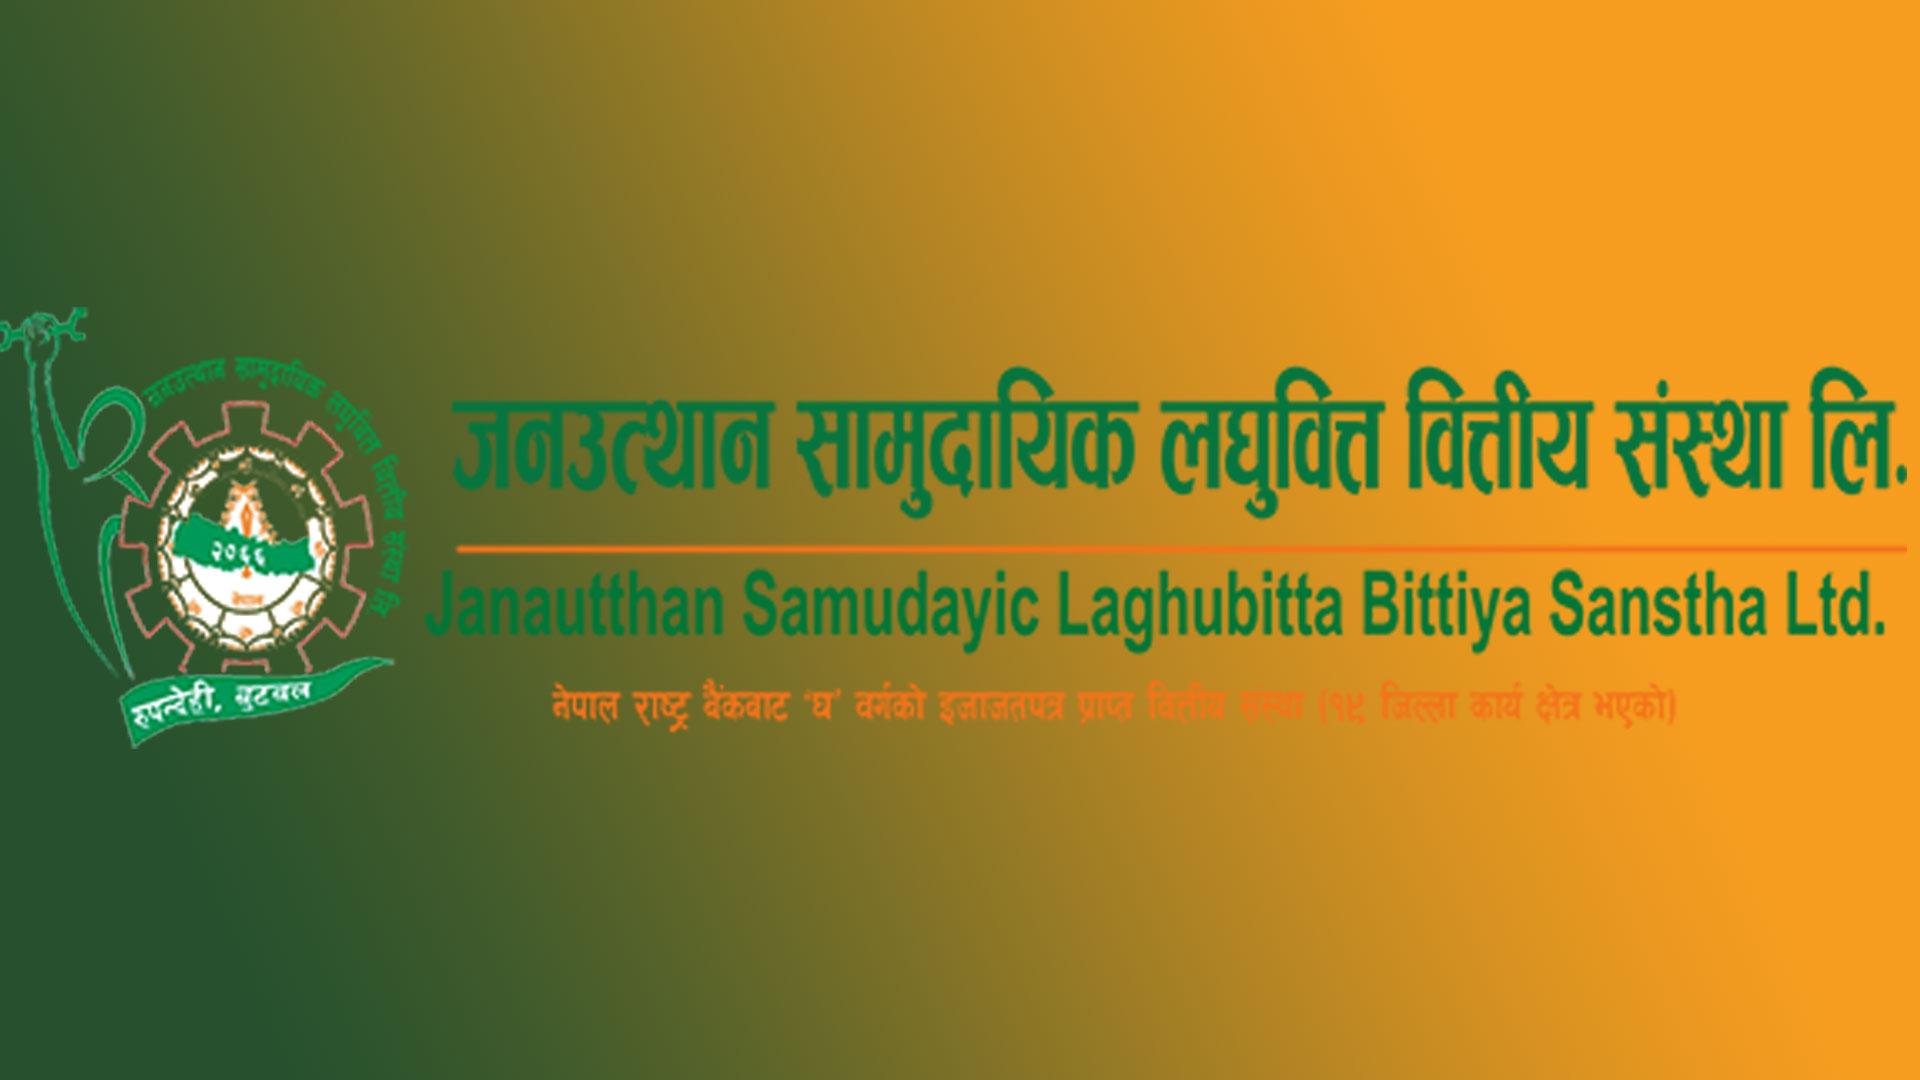 Janautthan Samudayic Laghubitta